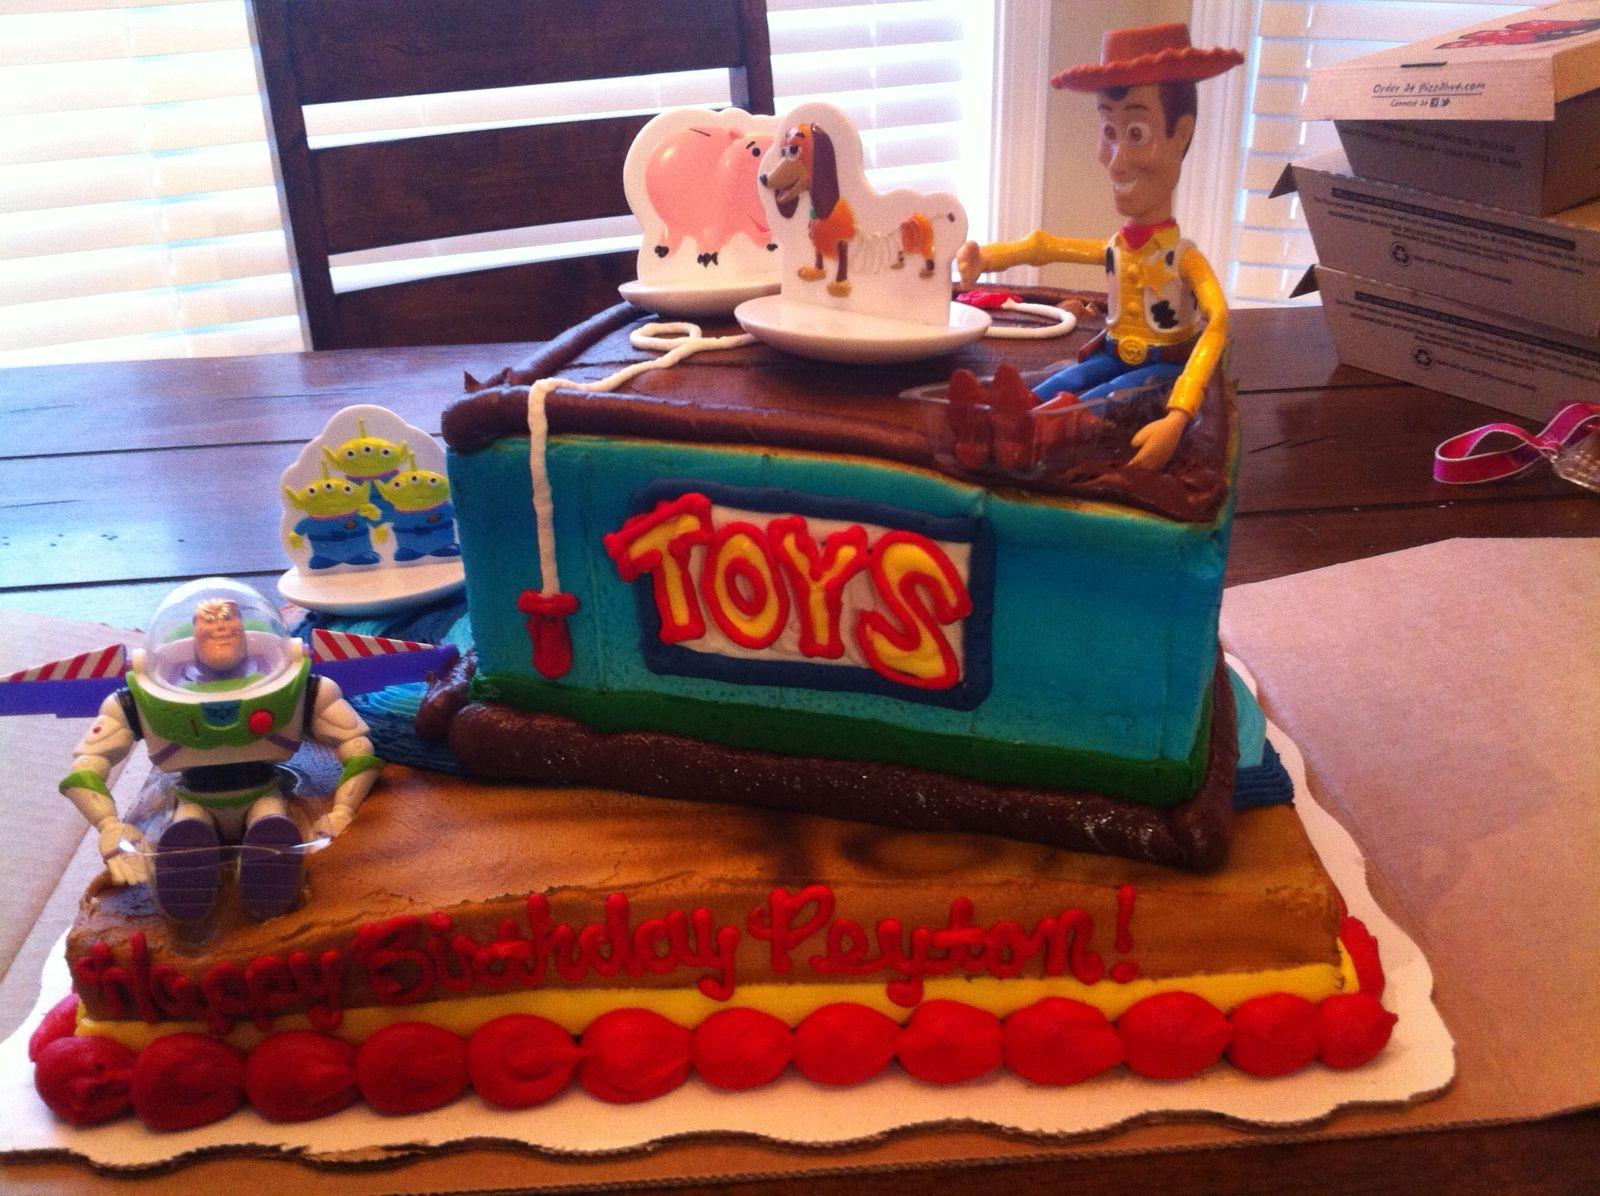 Peyton S Toy Story Birthday Cake Walmart Toy Story Birthday Cake Toy Story Birthday Toy Story Cakes